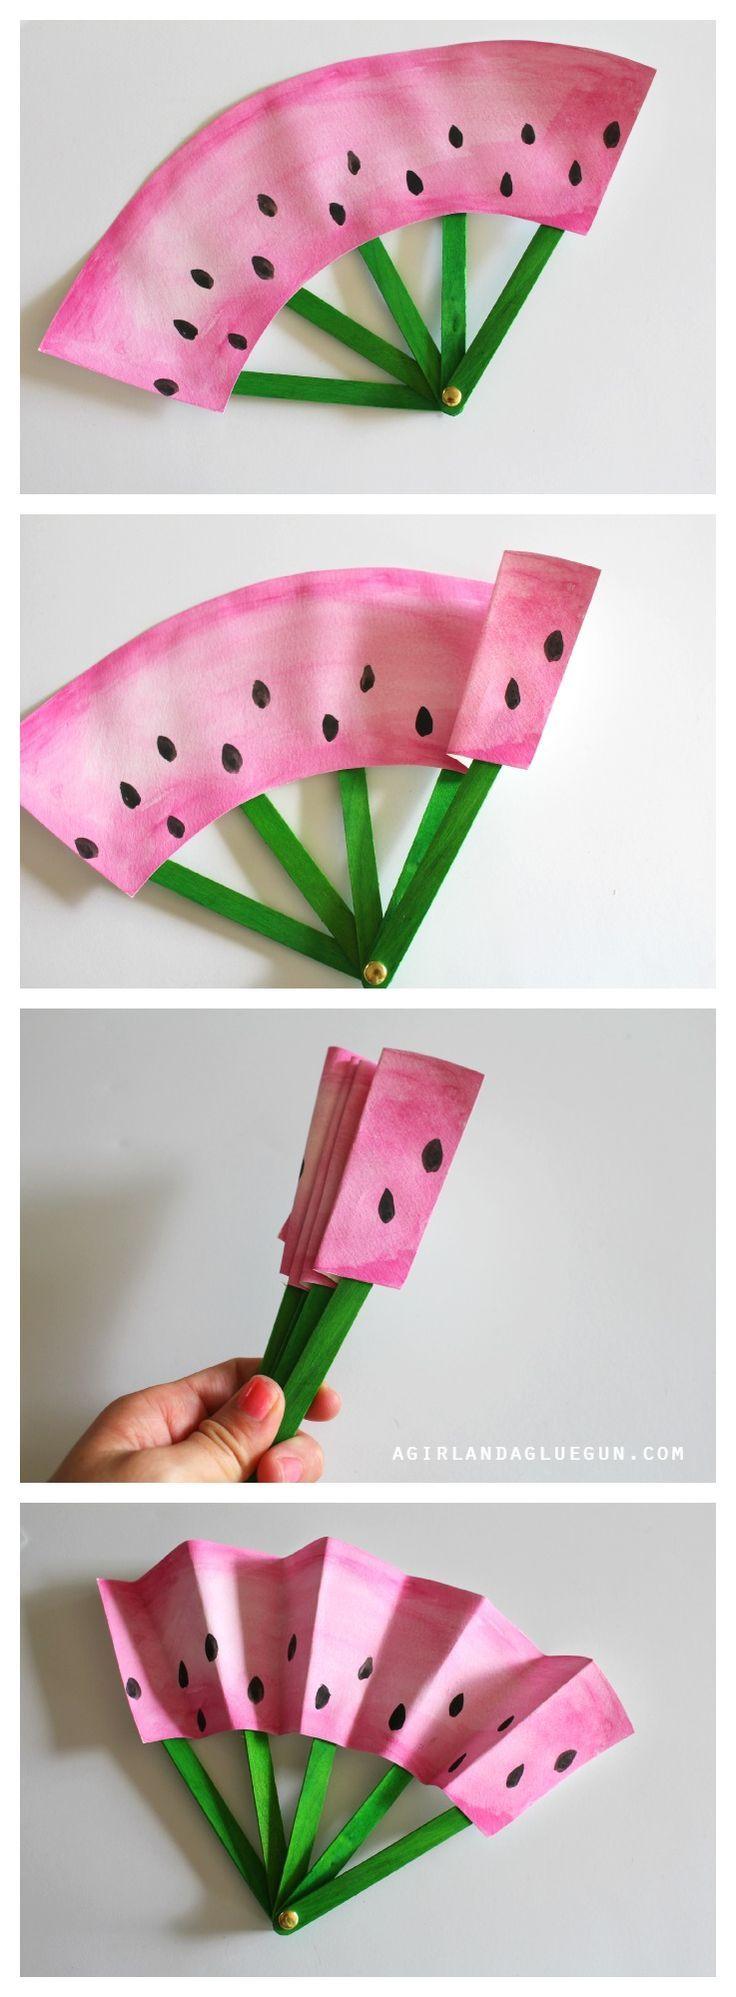 Marvelous Cool Kid Craft Ideas Part - 14: Diy Fruit Fans -a Fun Kids Crafts